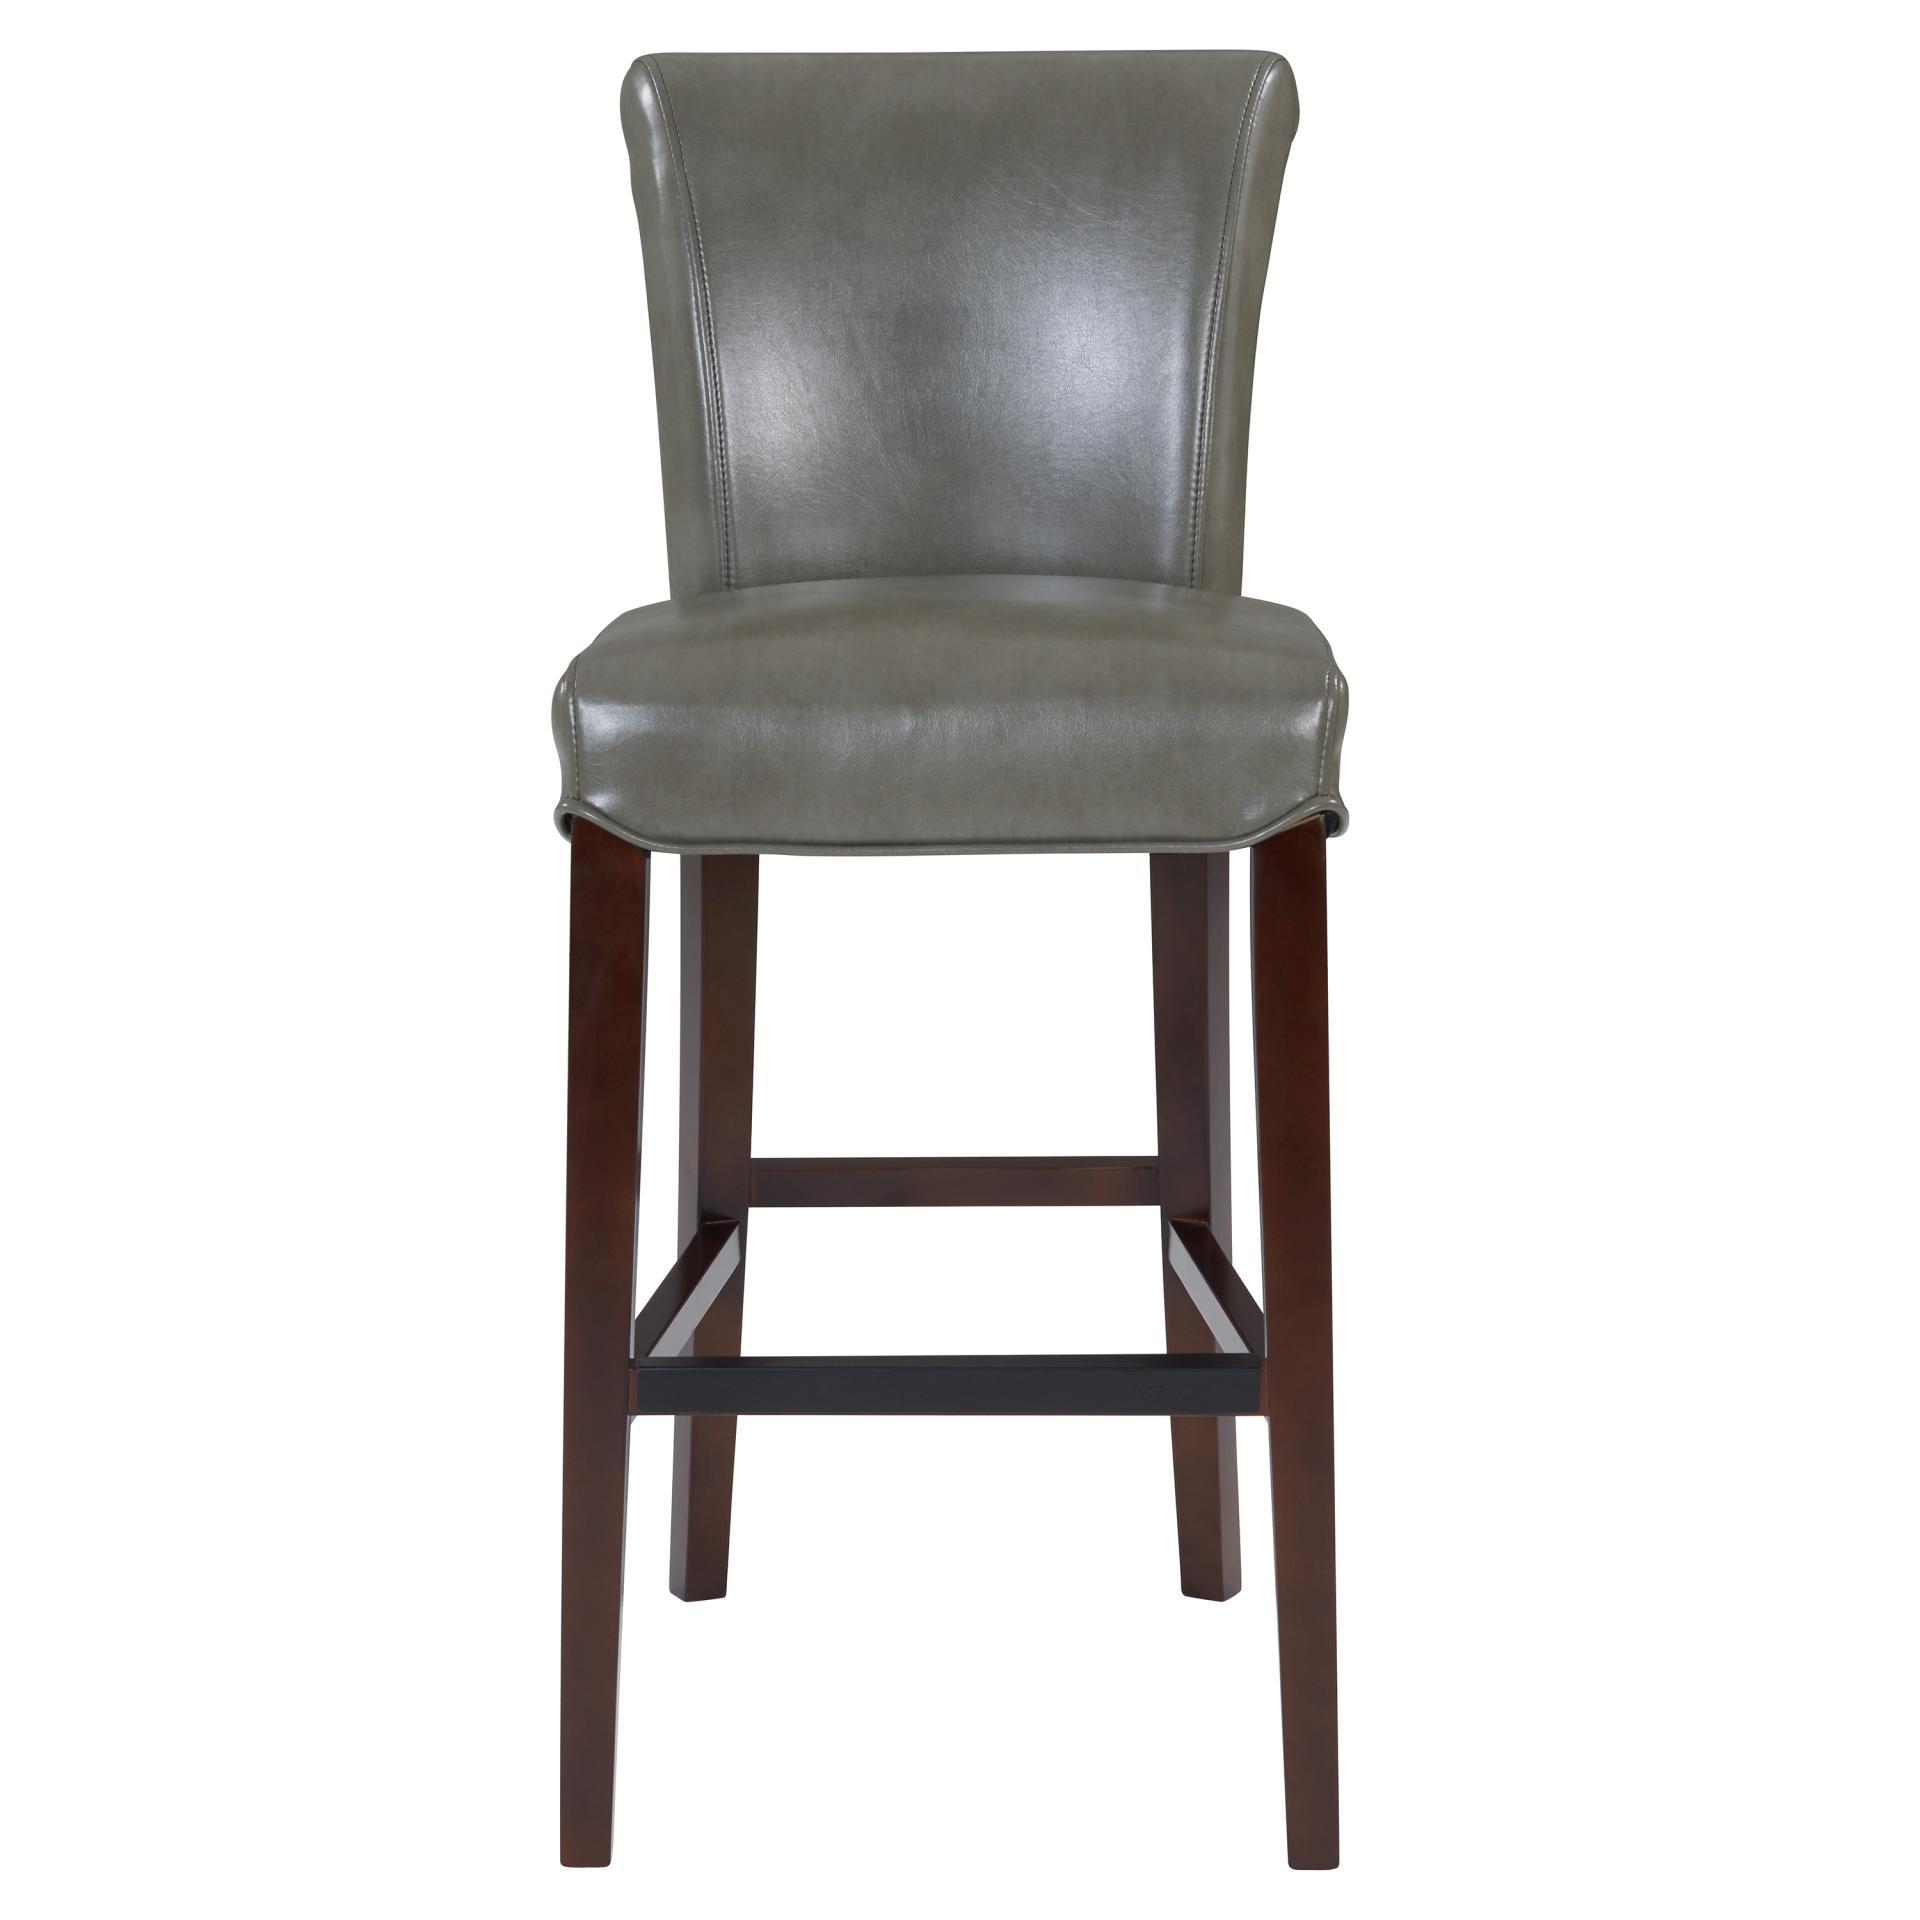 1485b 017 Npd Home Furniture Wholesale Lifestyle